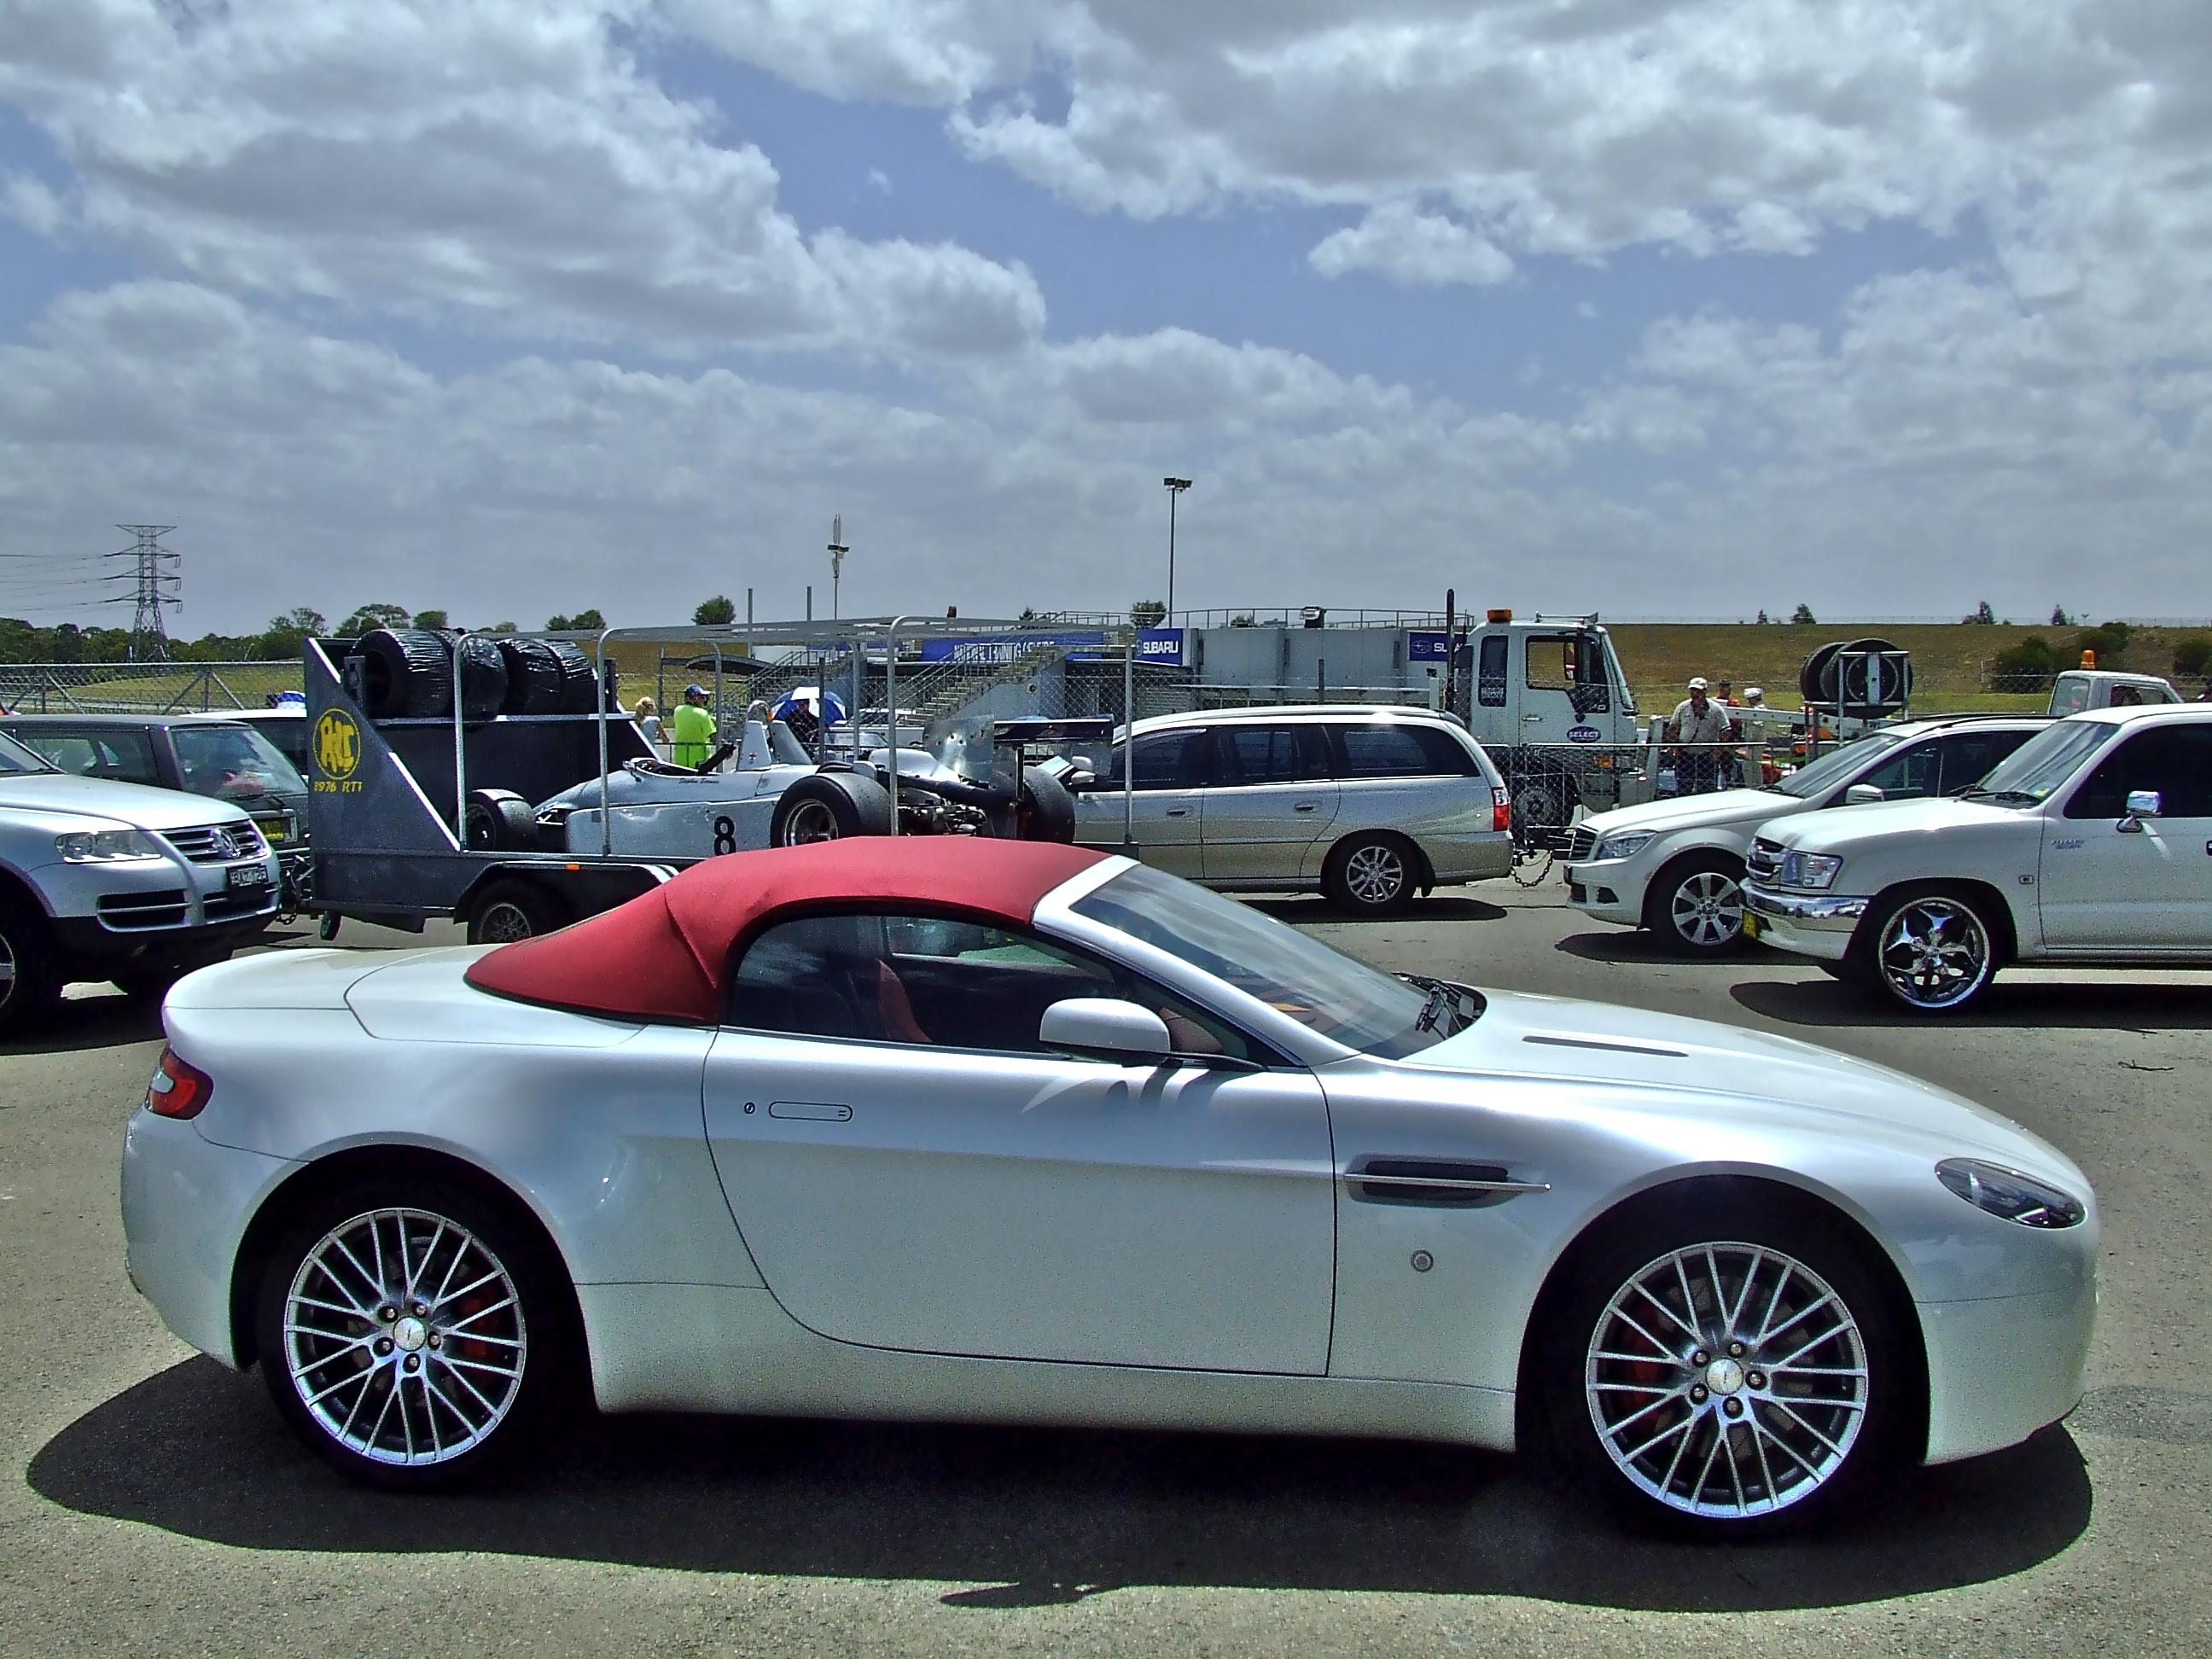 Aston Martin Vantage Roadster Backgrounds, Compatible - PC, Mobile, Gadgets  2592x1944 px